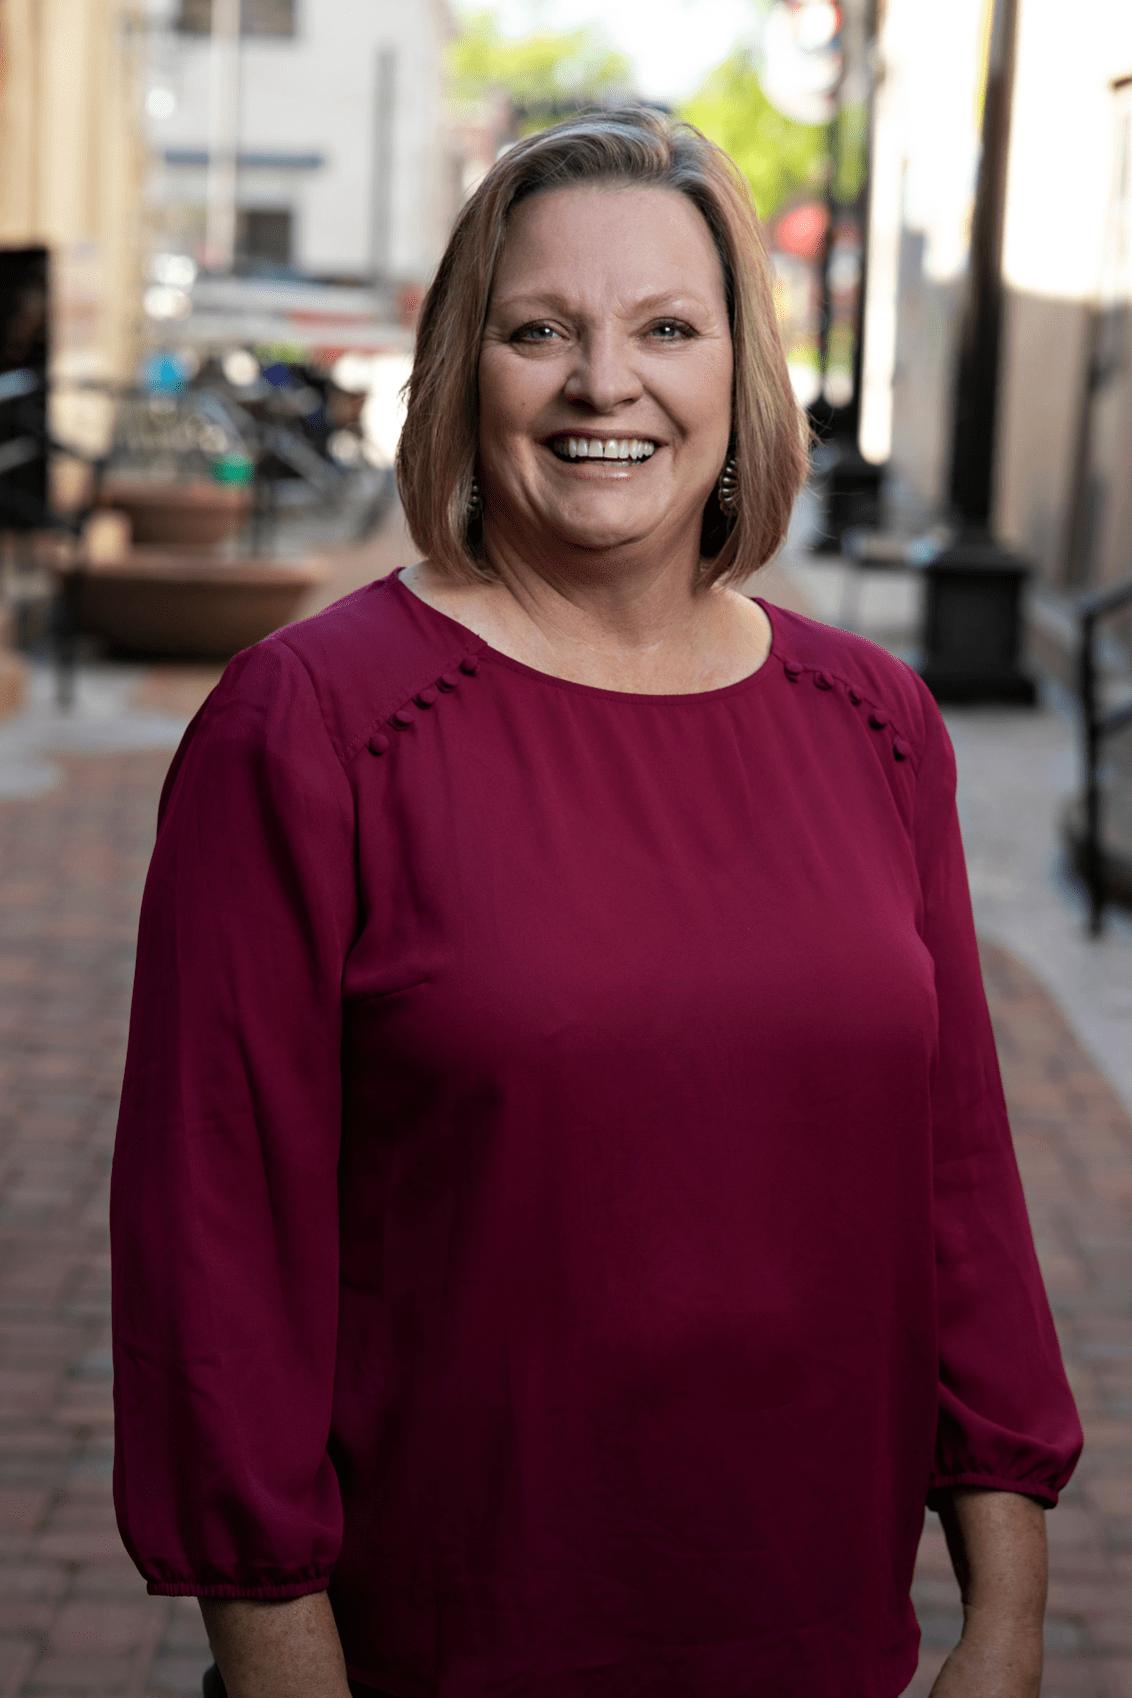 Elaine Eckstrom, RN, BSN